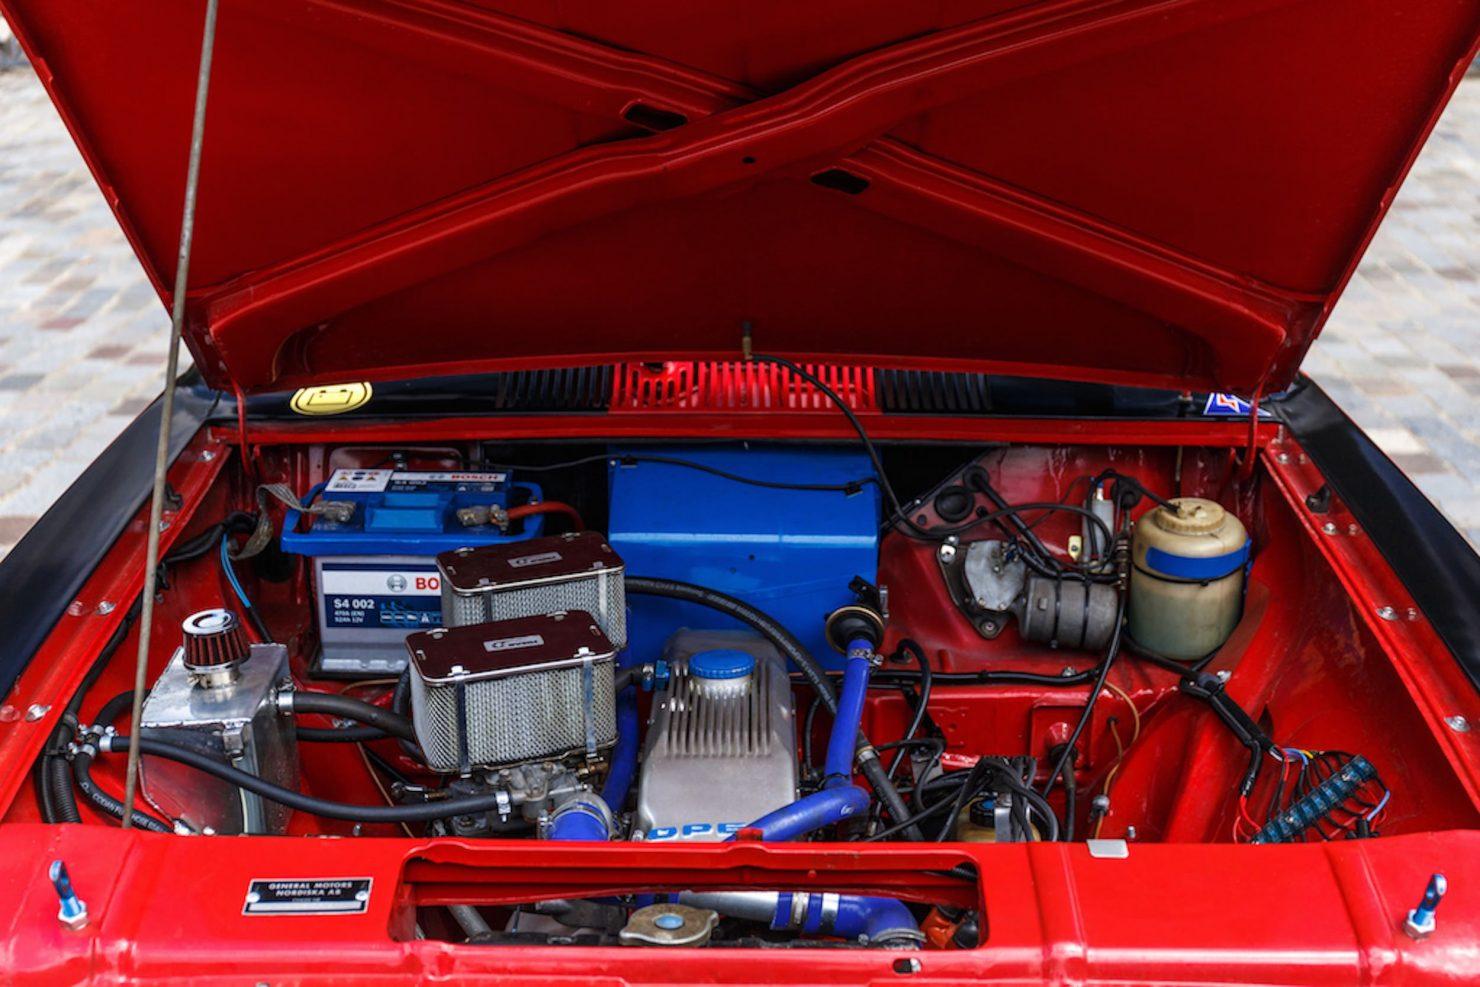 opel kadett rallye car 12 1480x987 - 1969 Opel Rallye Kadett